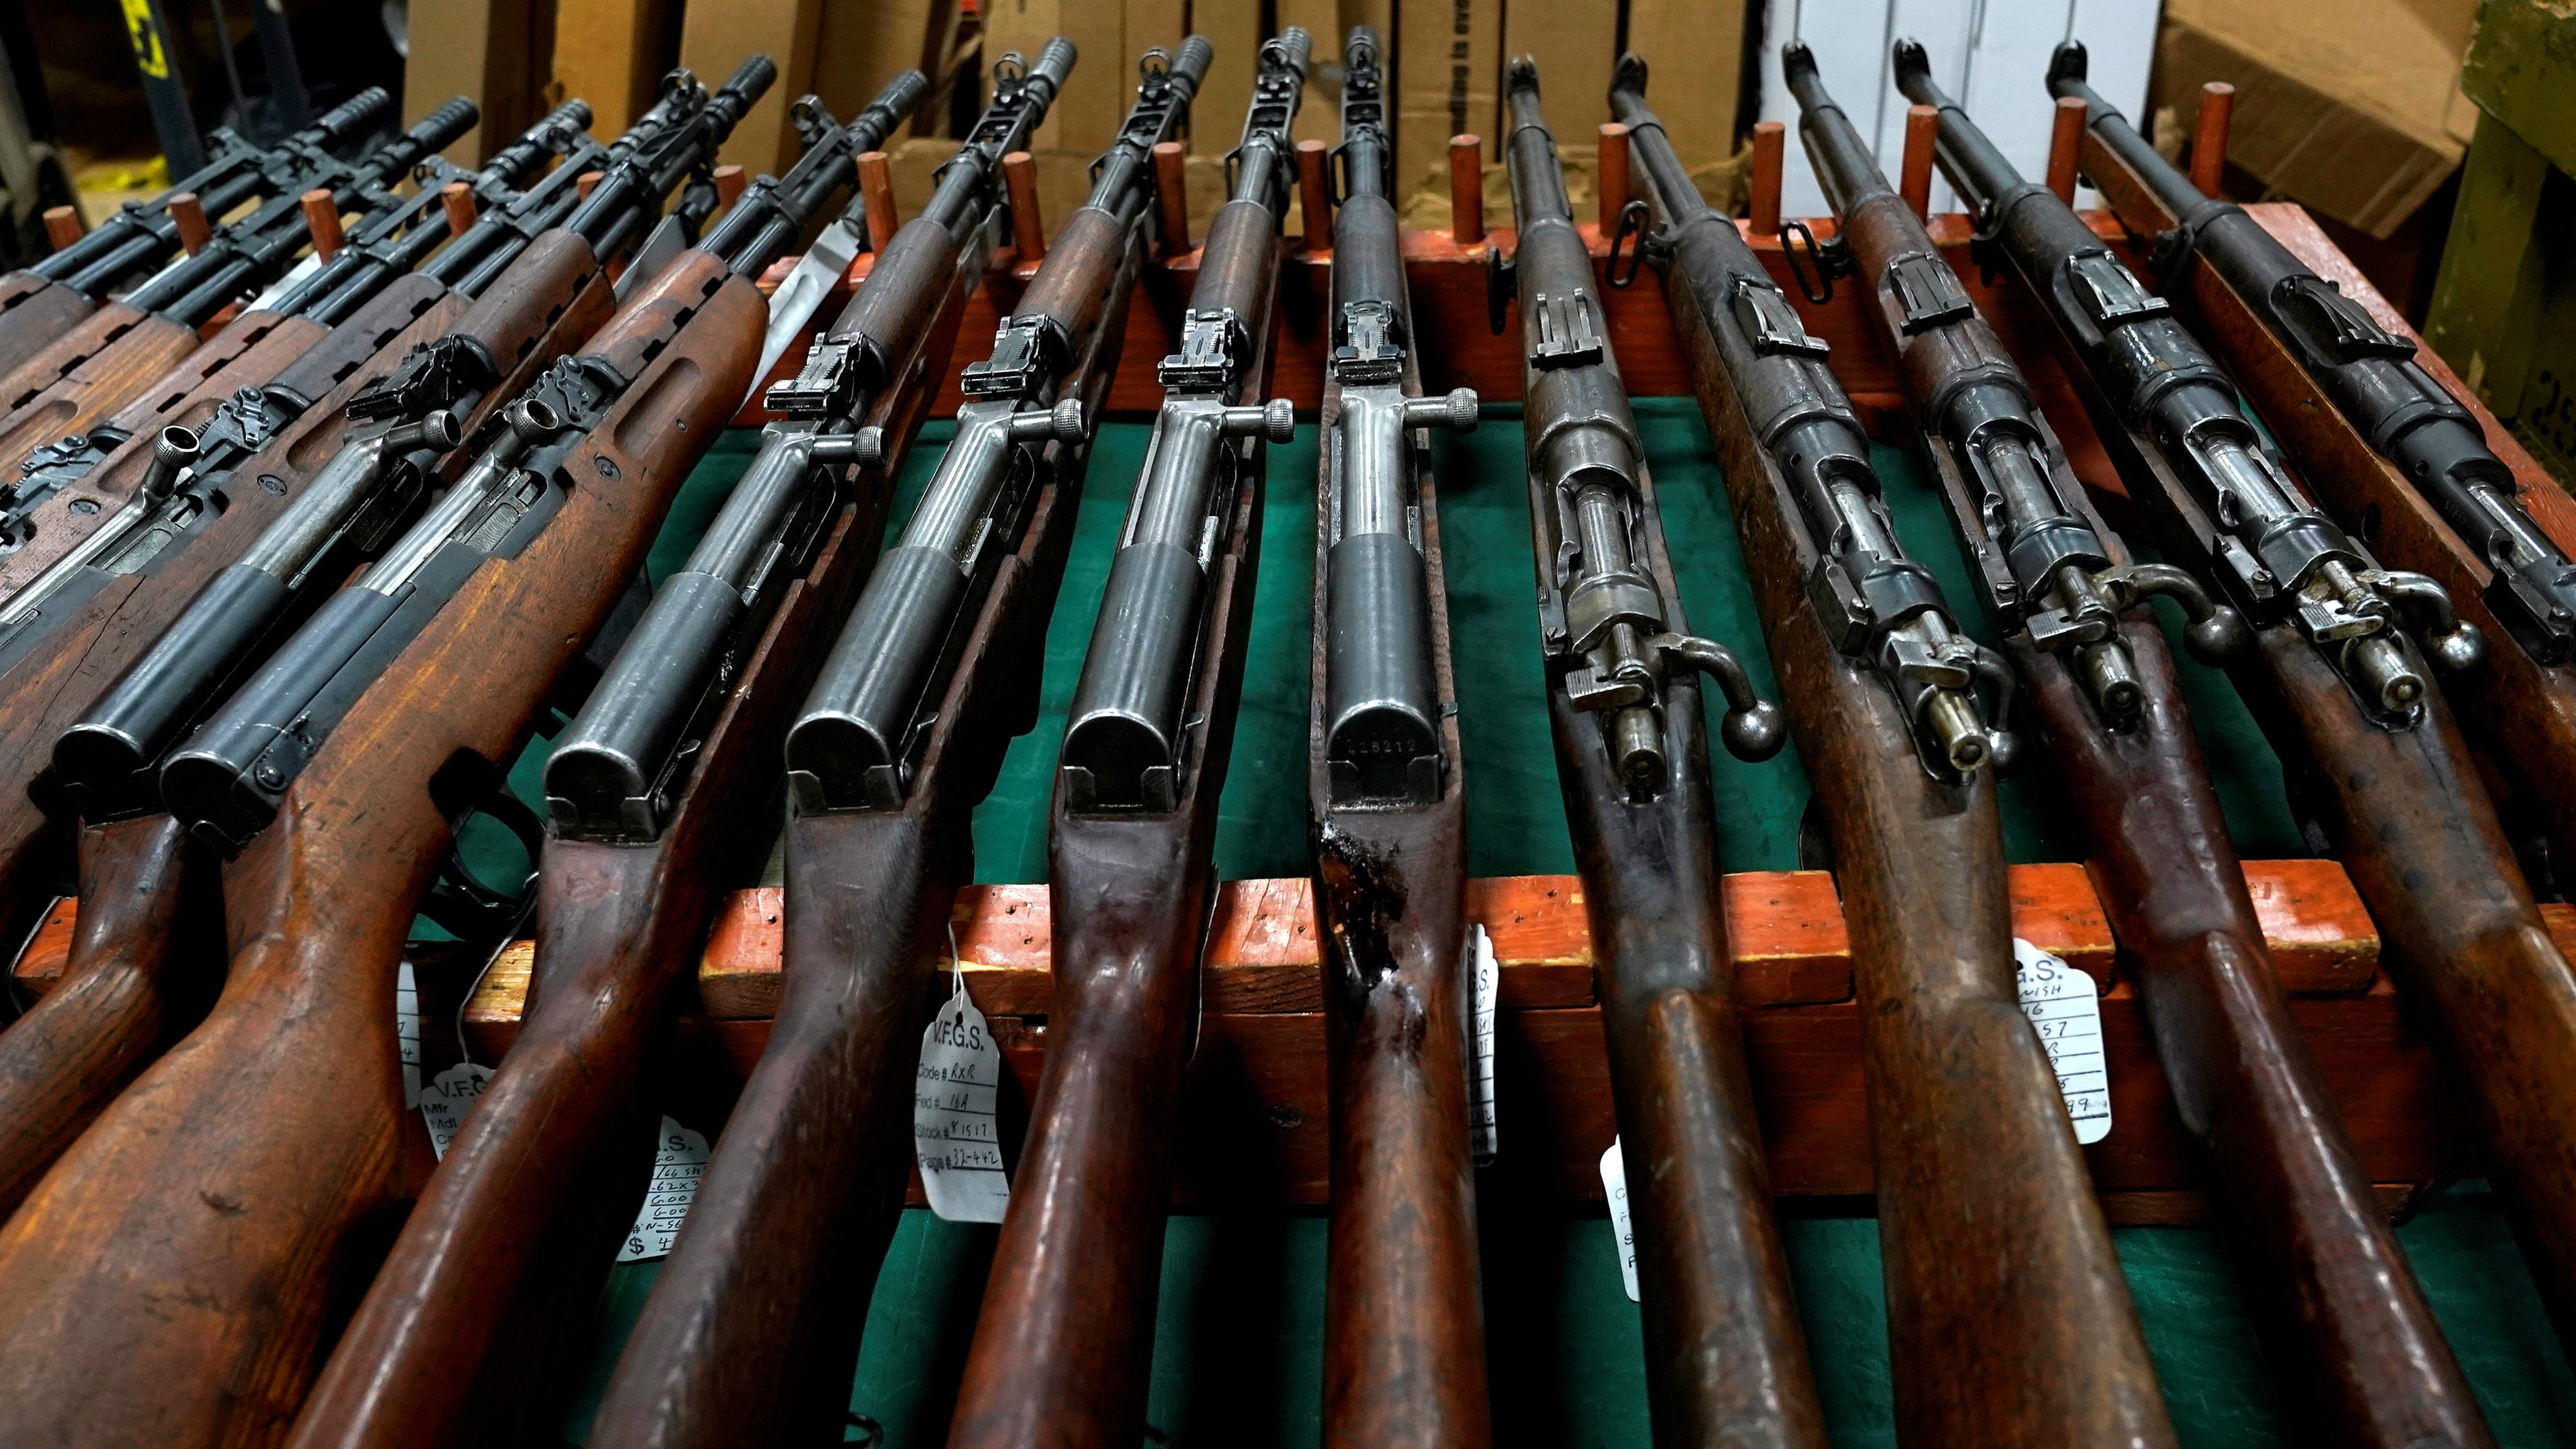 c-guns2-RTS1FGSF-Joshua Roberts